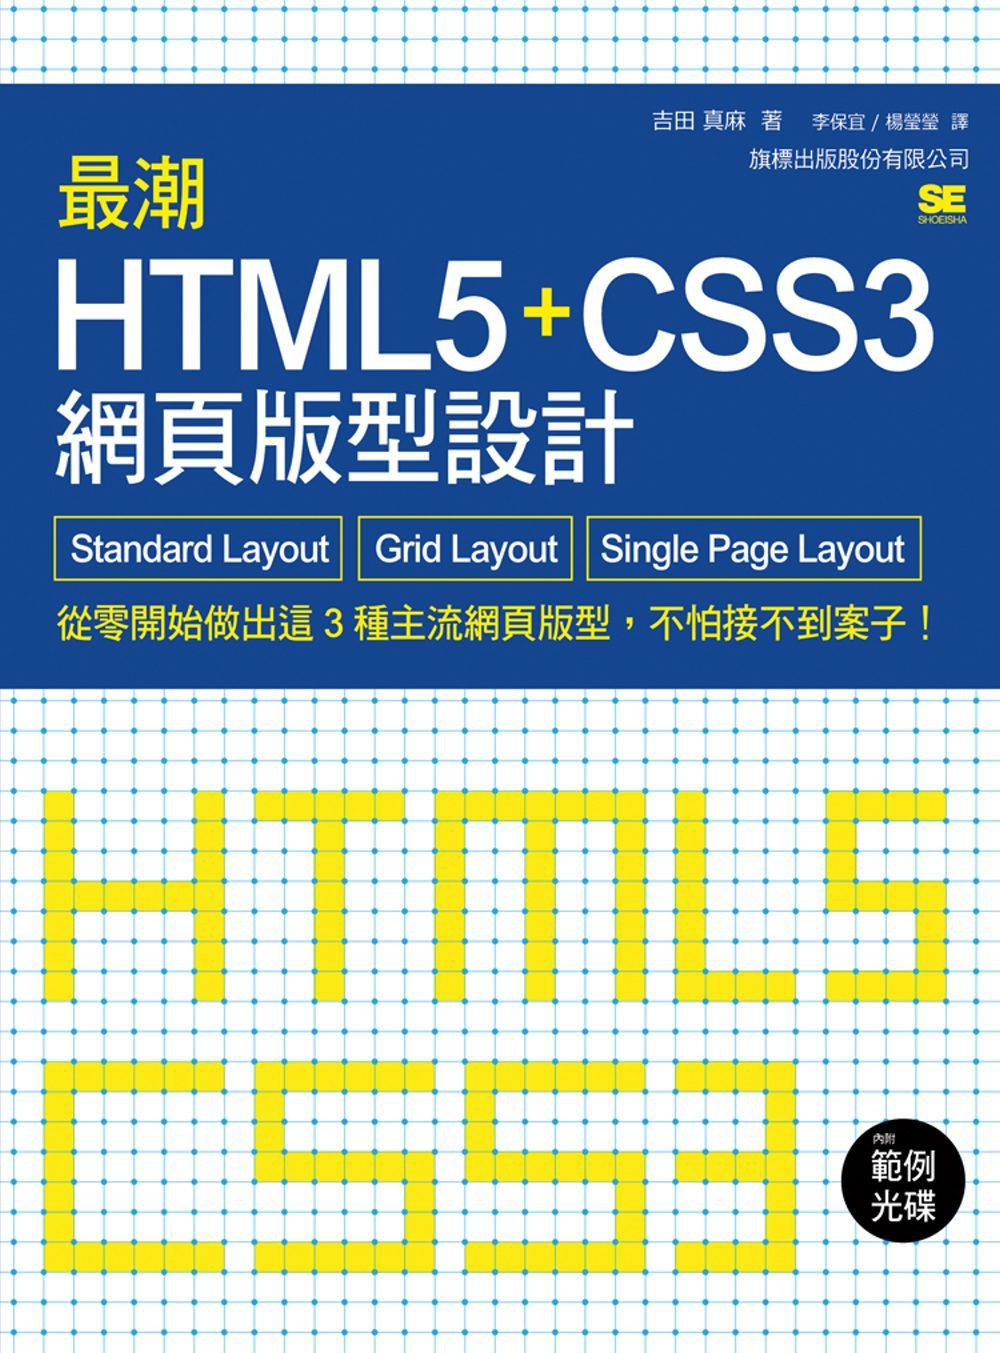 最潮 HTML5+CSS3 網頁版型設計